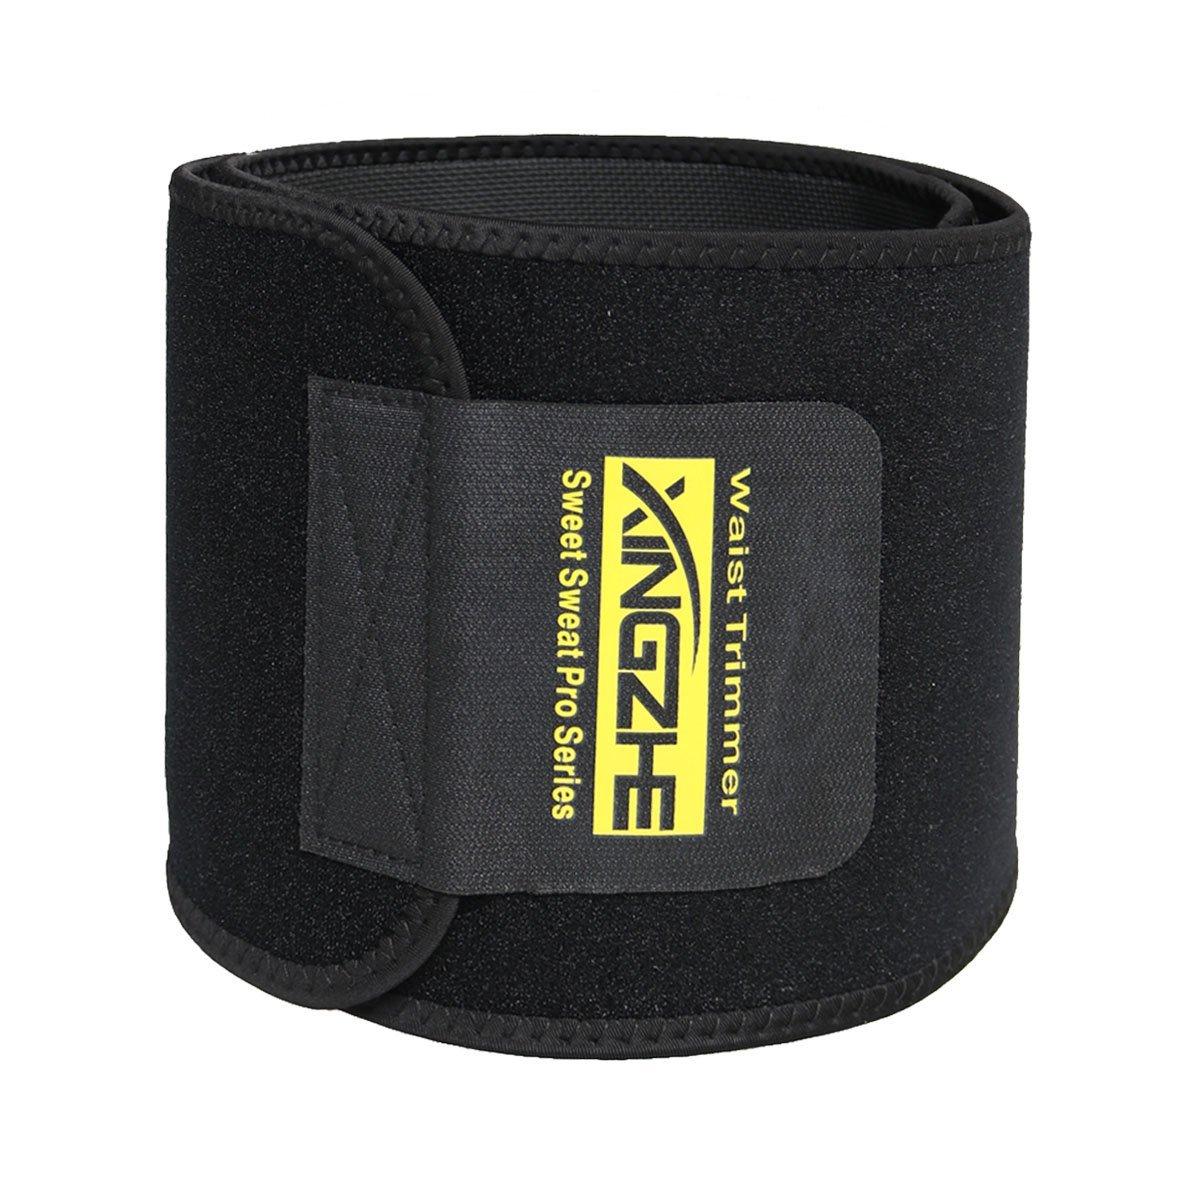 Waist Trimmer - Weight Loss Ab Belt - Exercise Waistband - Abdominal Support Belt - Adjustable Workout Wraps for Women & Men - Belly Sweat Band Fat Burner Weight Slimming Belt